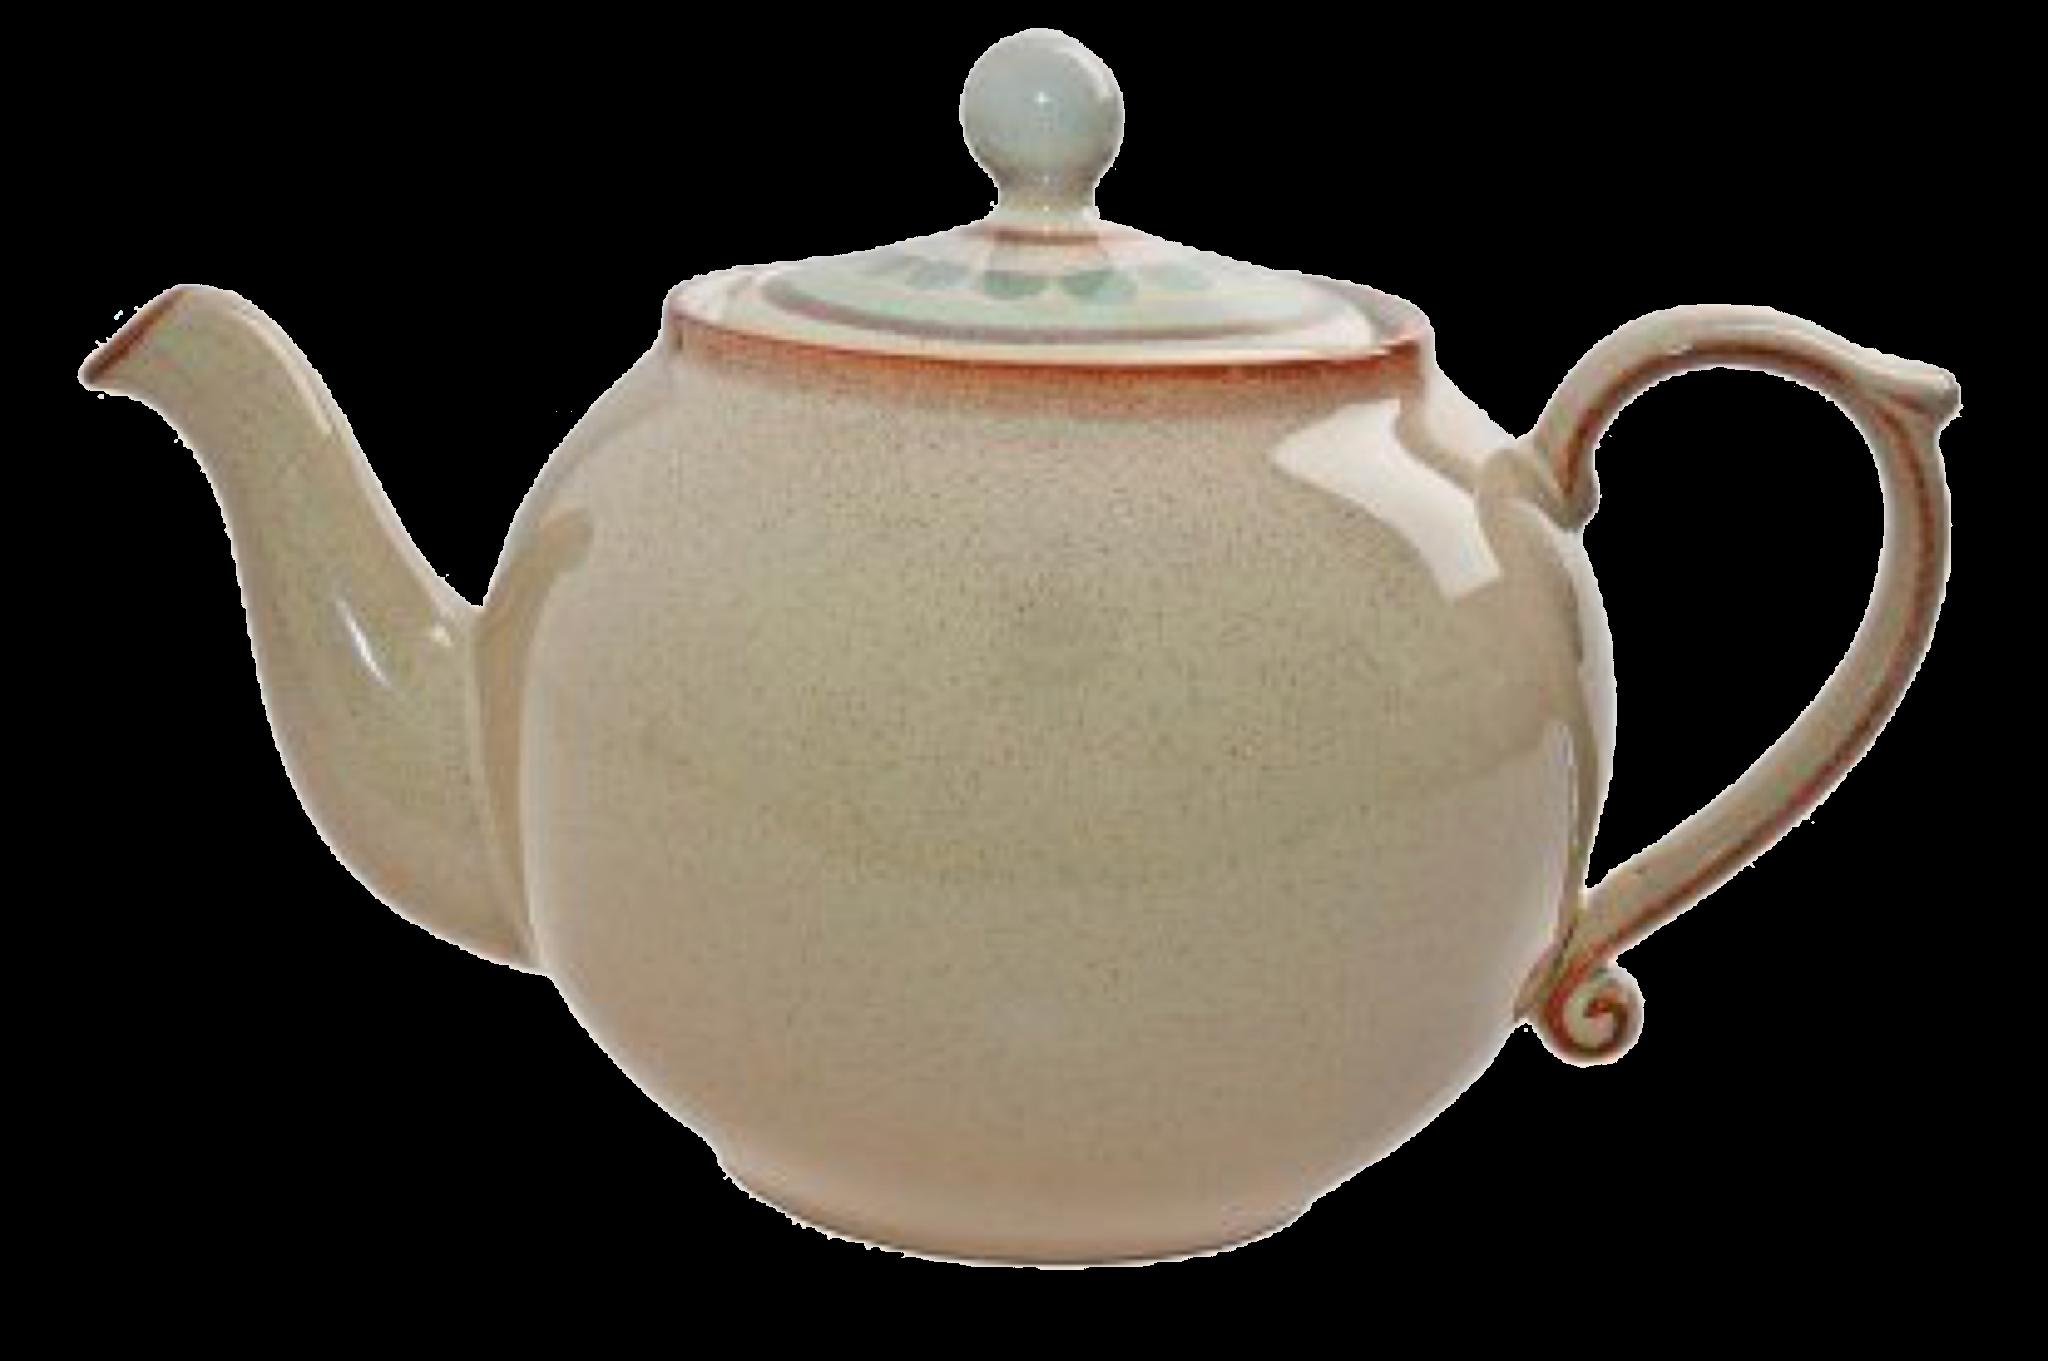 Utensils Clip Art Teapot Clipart Panda Free Clipart Images Tea Pots Tea Pots Vintage Tea Pot Illustration